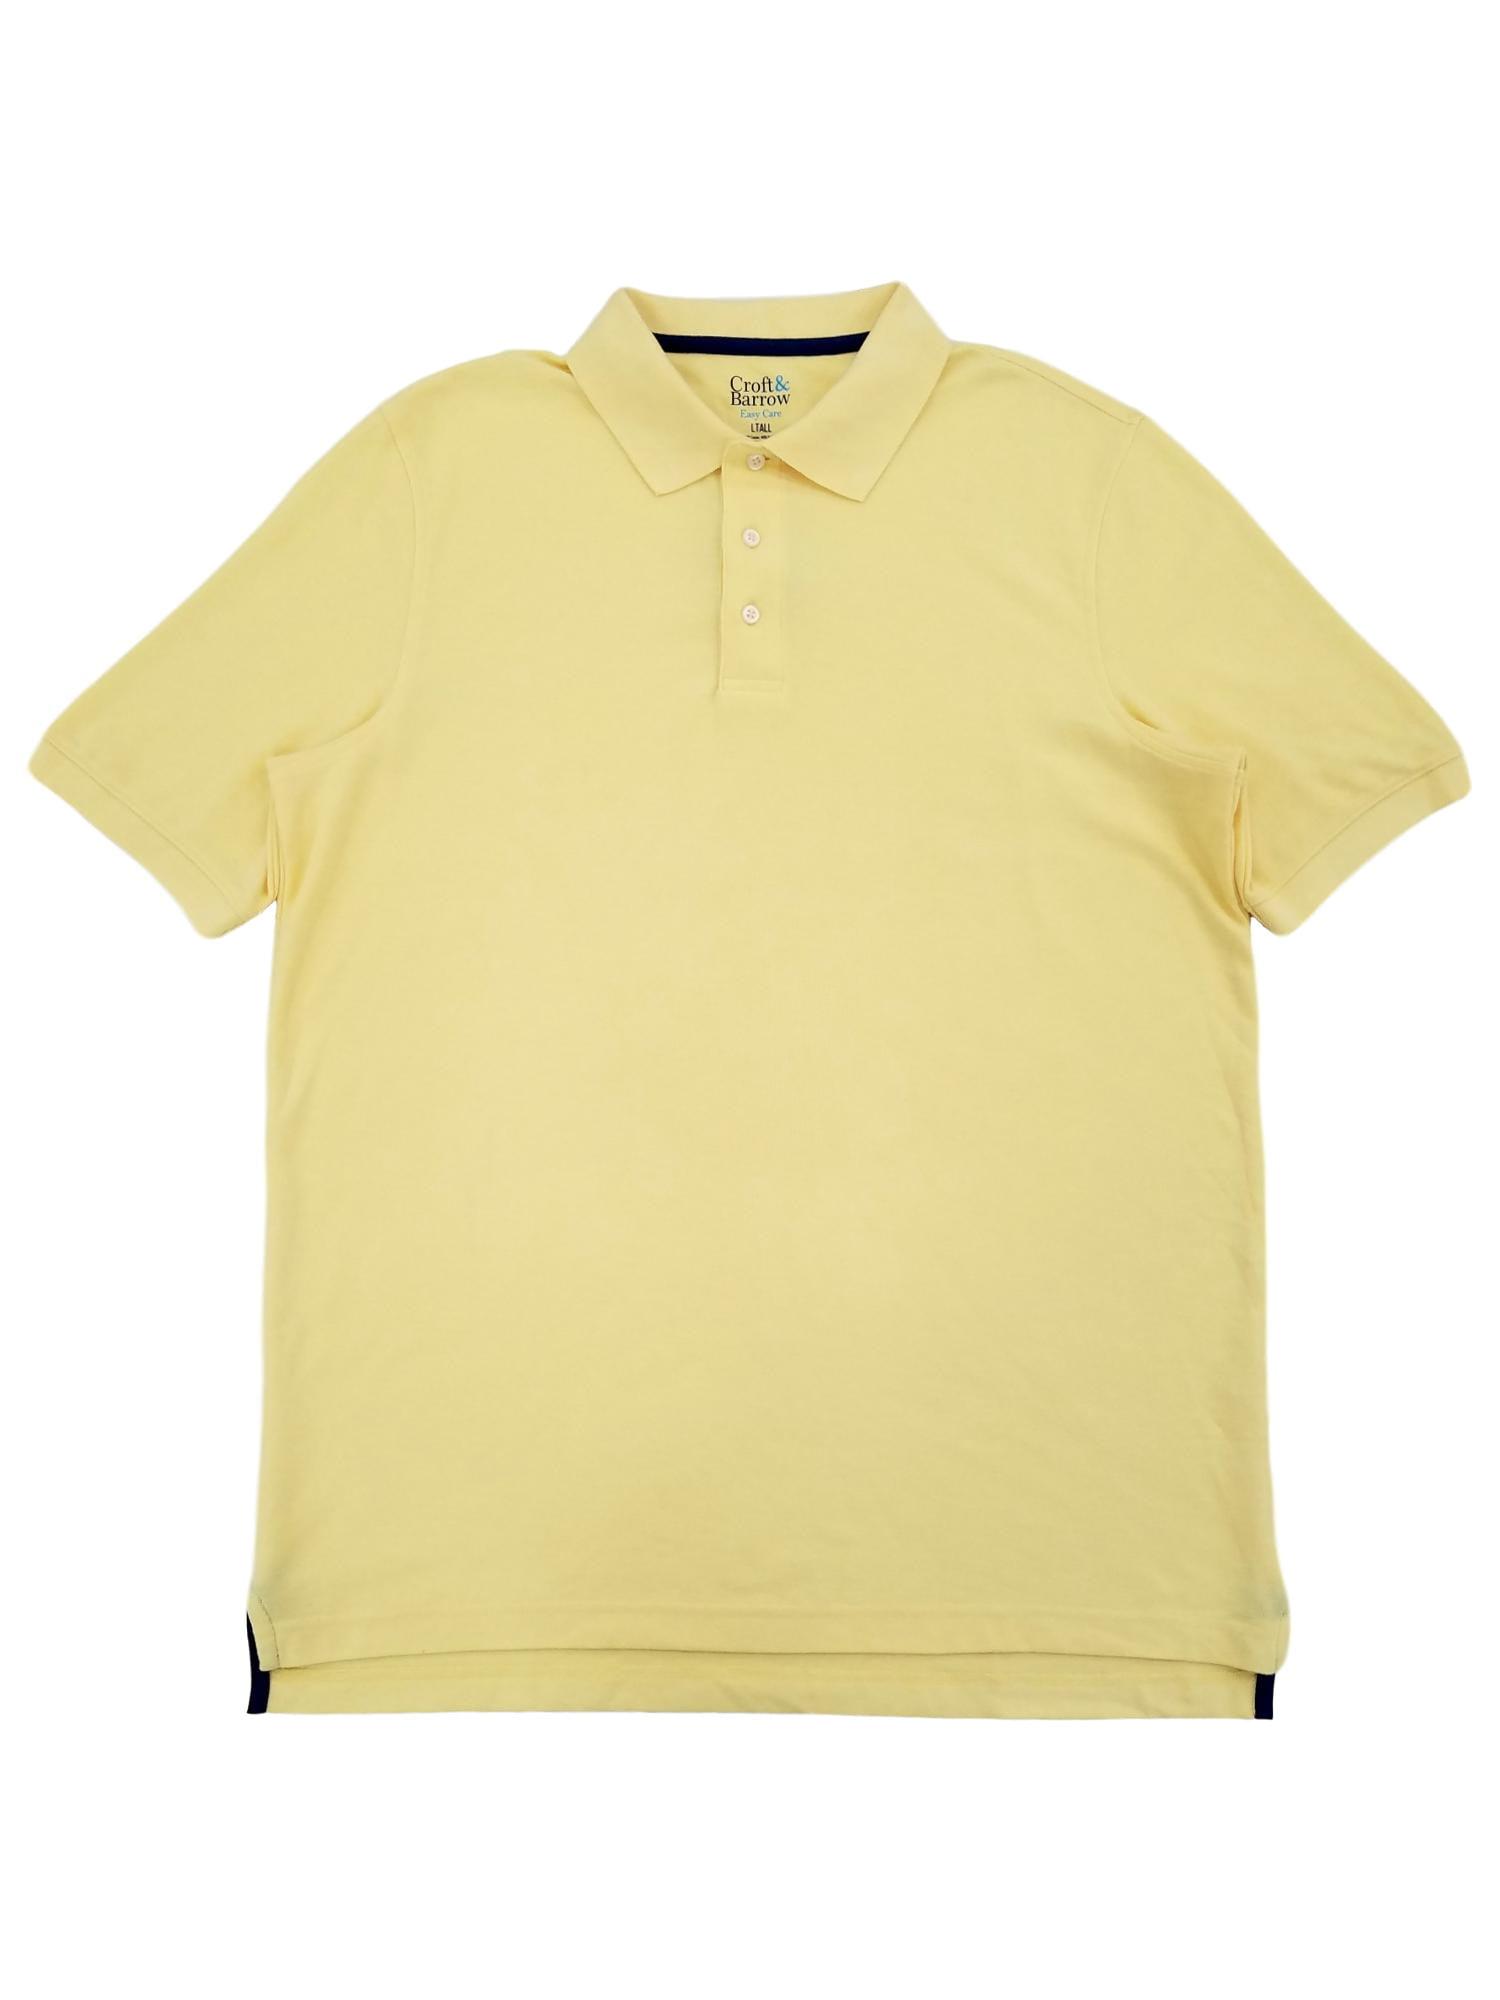 Croft & Barrow - Croft & Barrow Mens Big & Tall Yellow Performance Pique Polo T-Shirt - Walmart.com